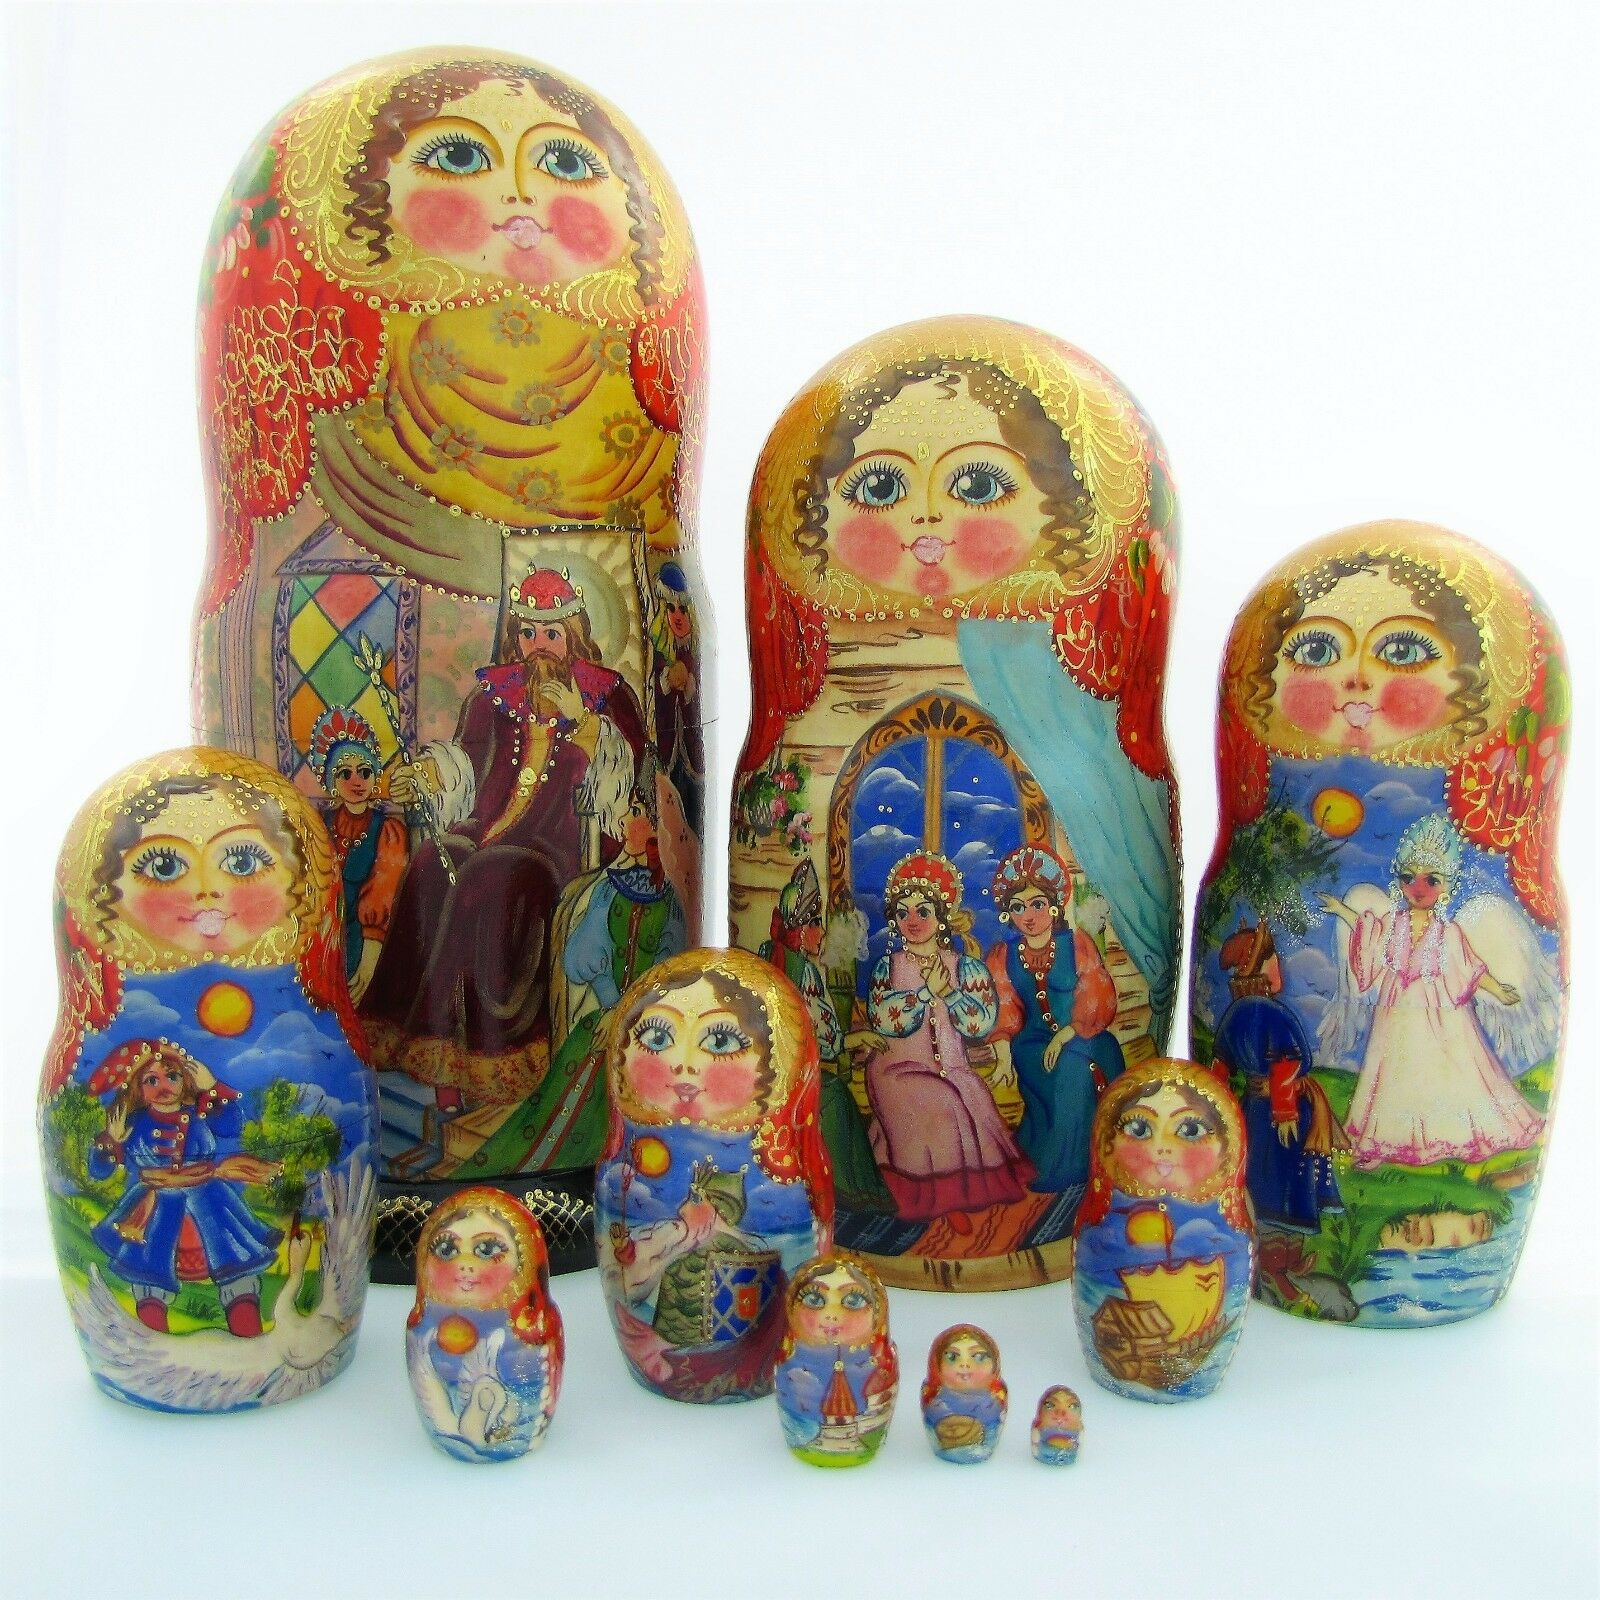 10 Poupée russe H28 peint main signé Matriochka Gigognes Nested Doll Matrioshka